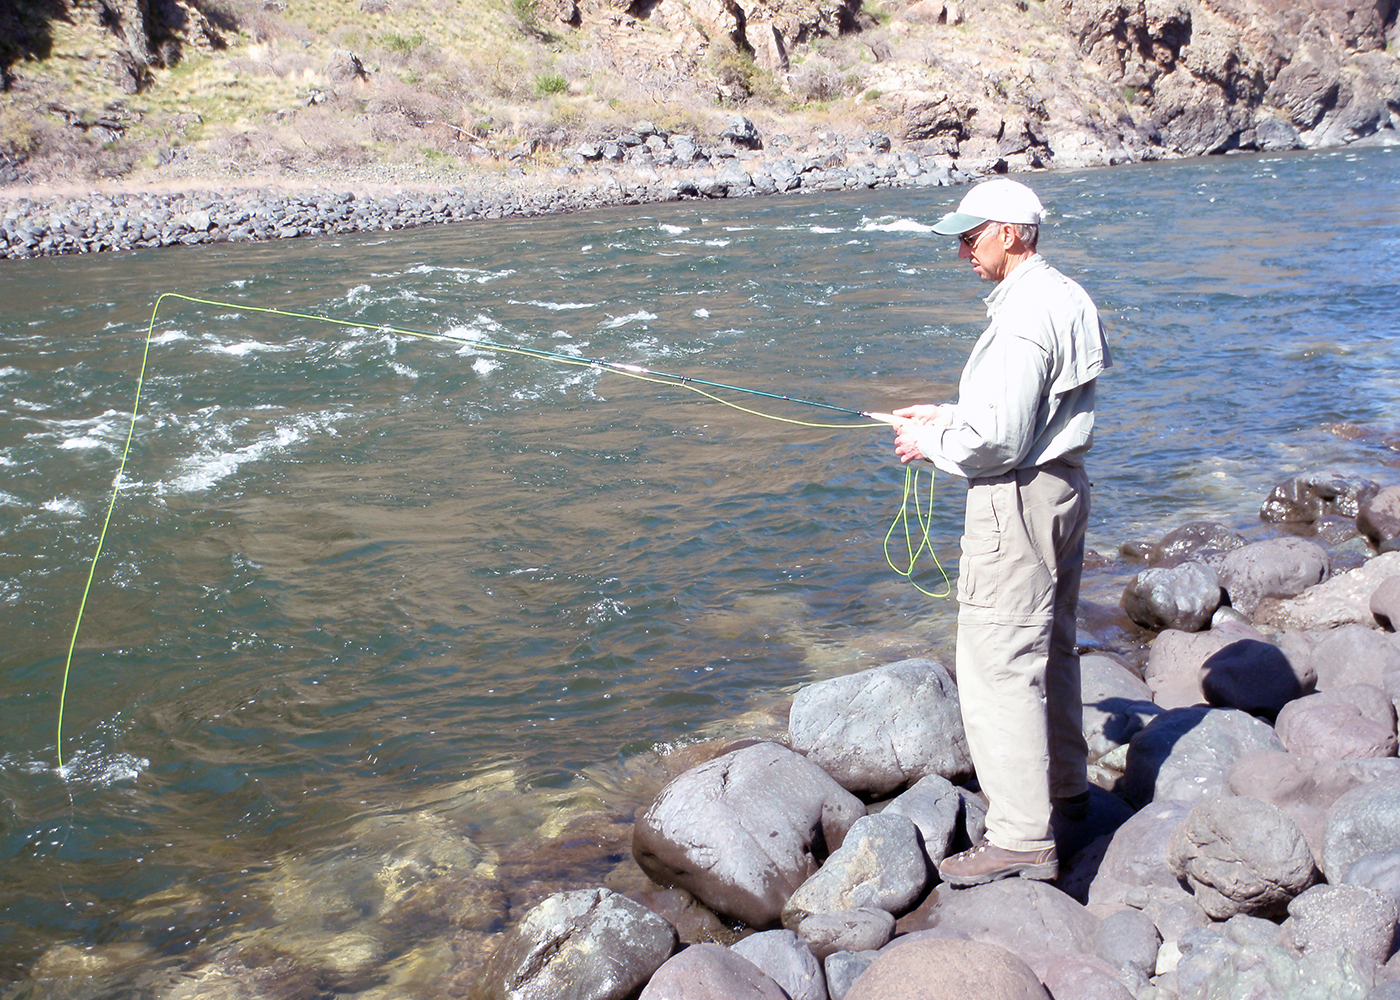 Volunteer Vacation Hells Canyon Idaho Sierra Club Outings